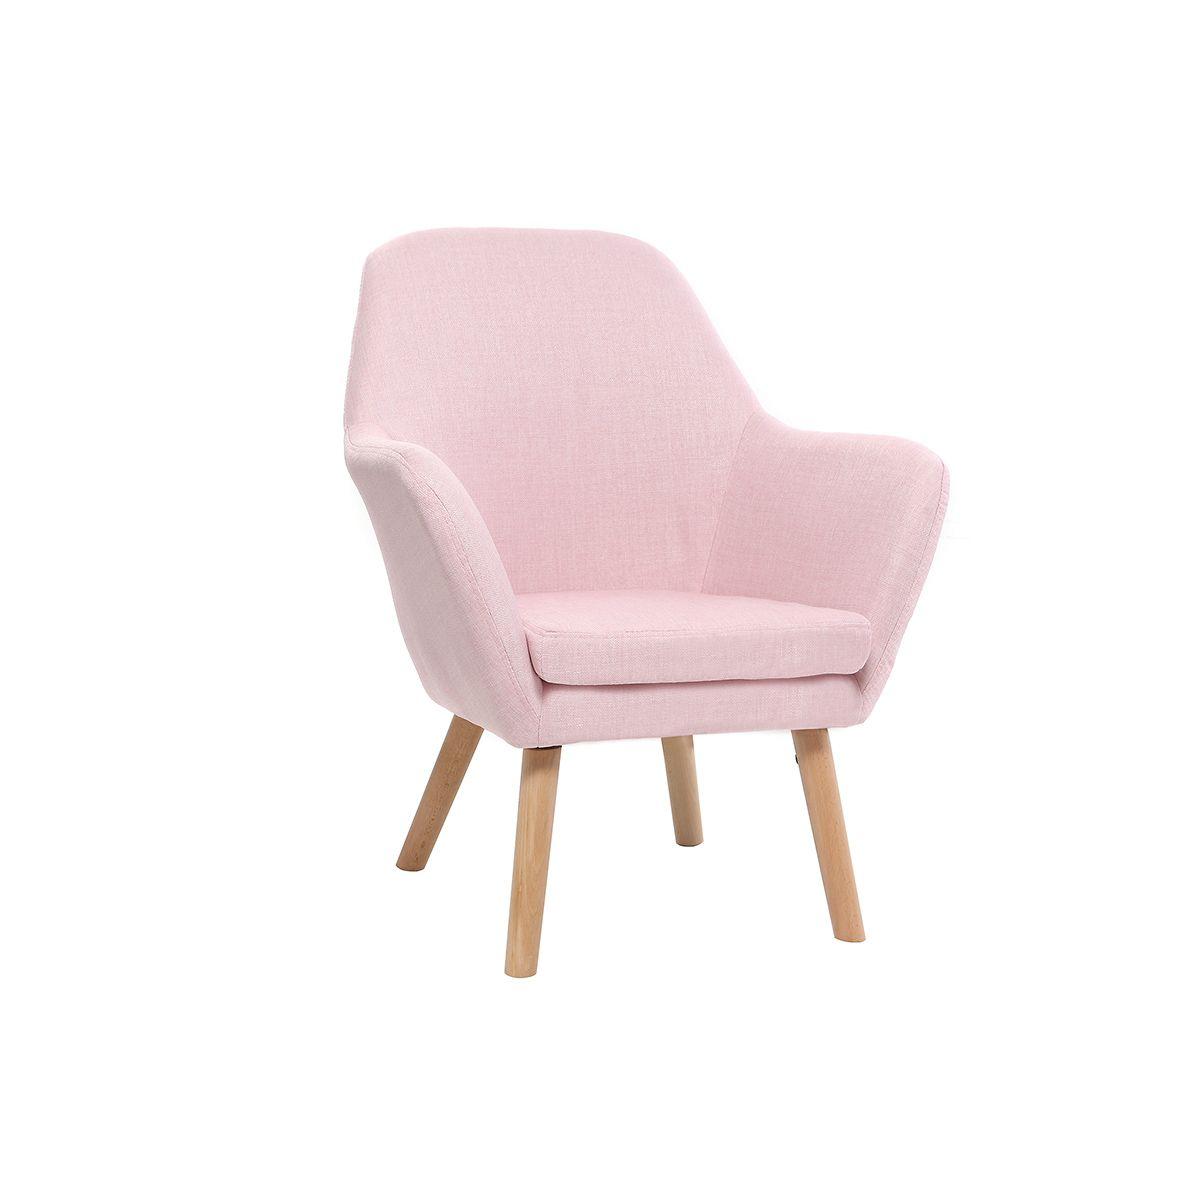 Poltrona bambino design rosa BABY MIRA Offerte e sconti